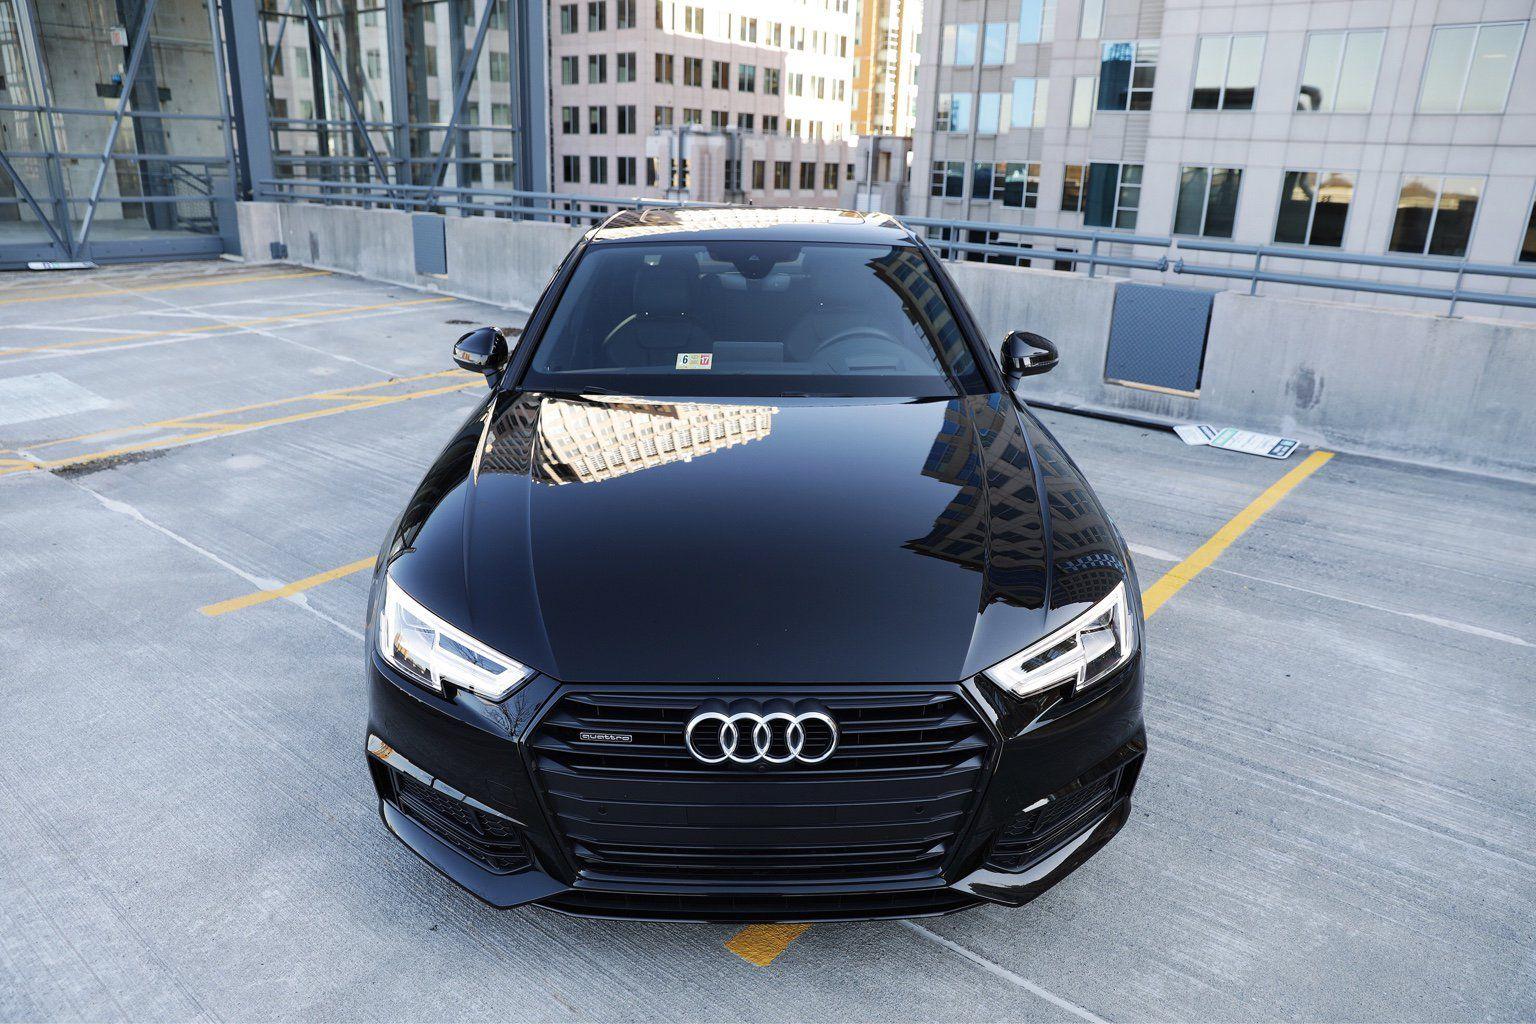 My B9 A4 Photoshoot Audi A4 Audi Quattro Audi